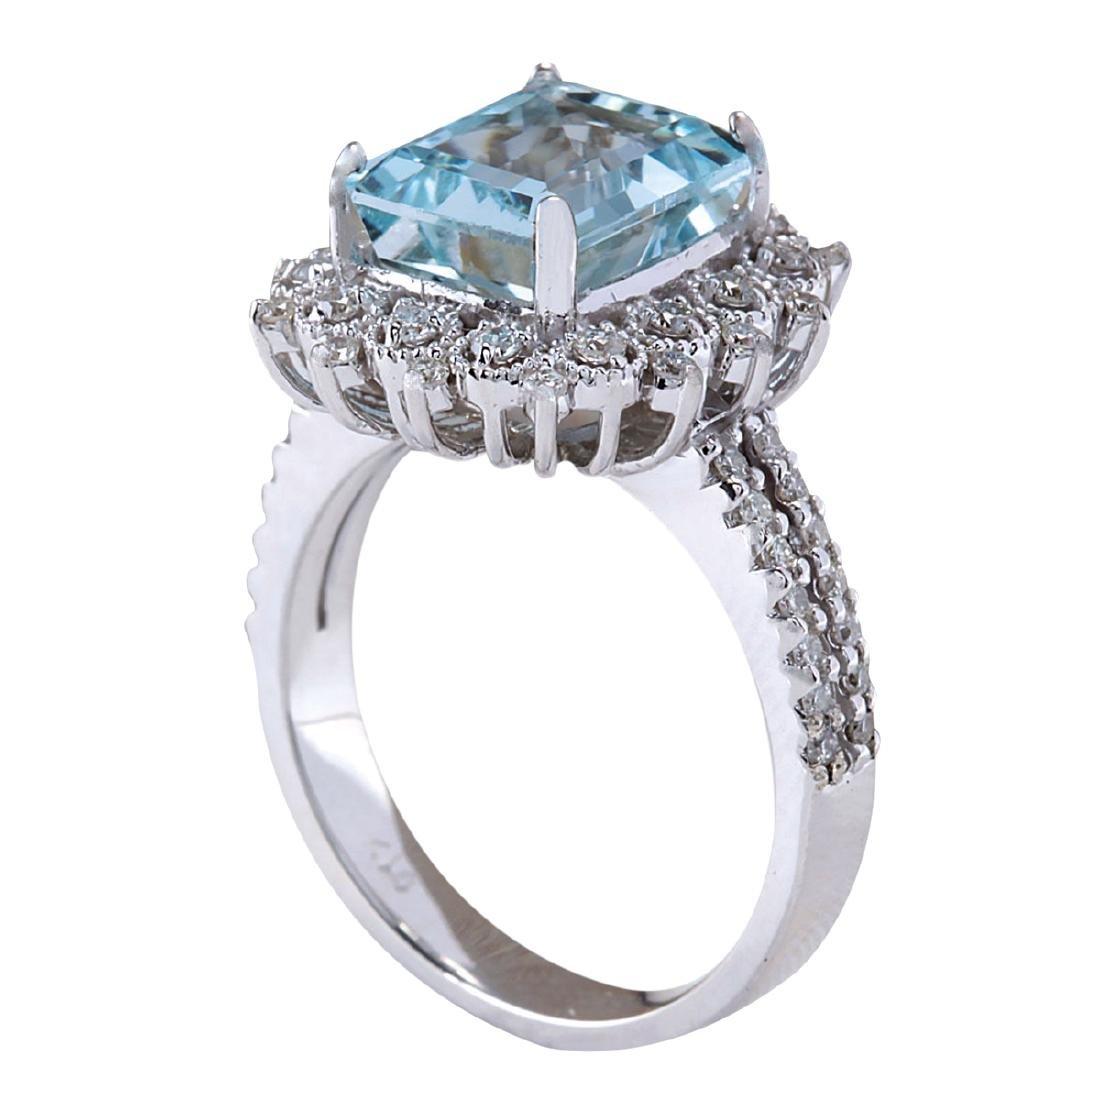 4.15CTW Natural Aquamarine And Diamond Ring In 18K - 3